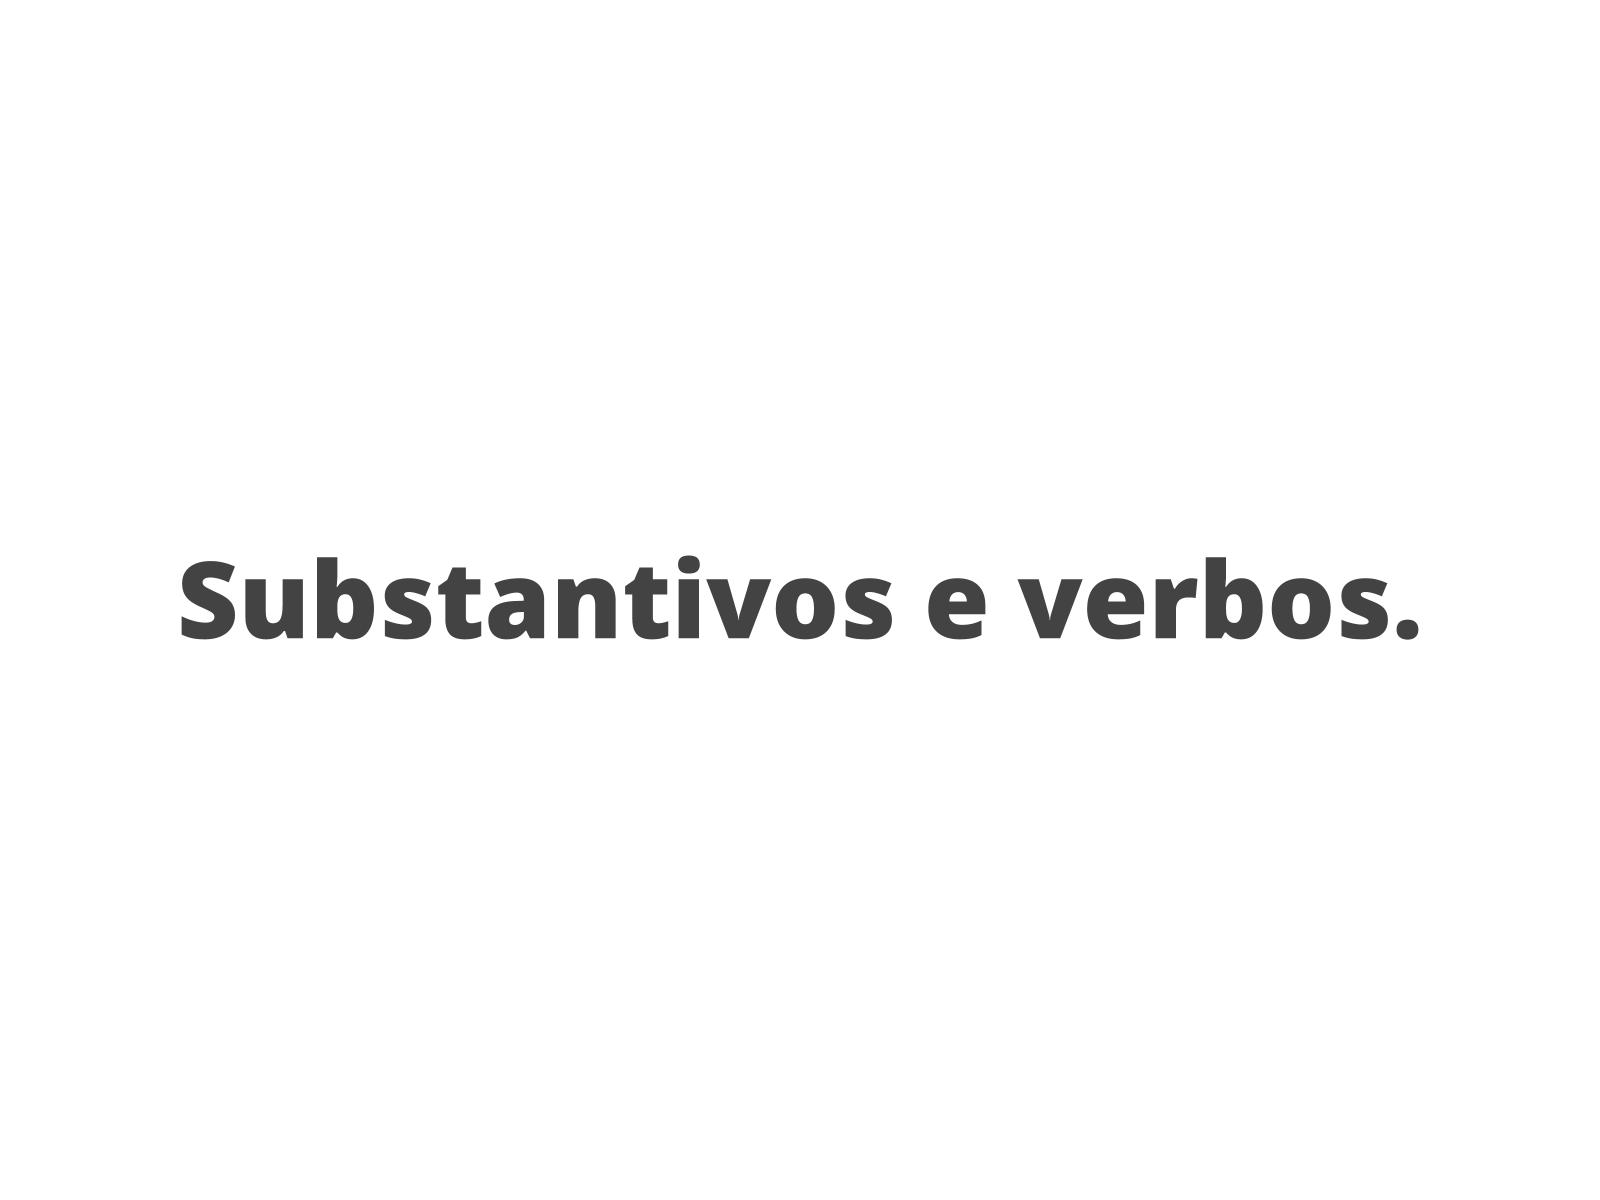 Entre substantivos e verbos